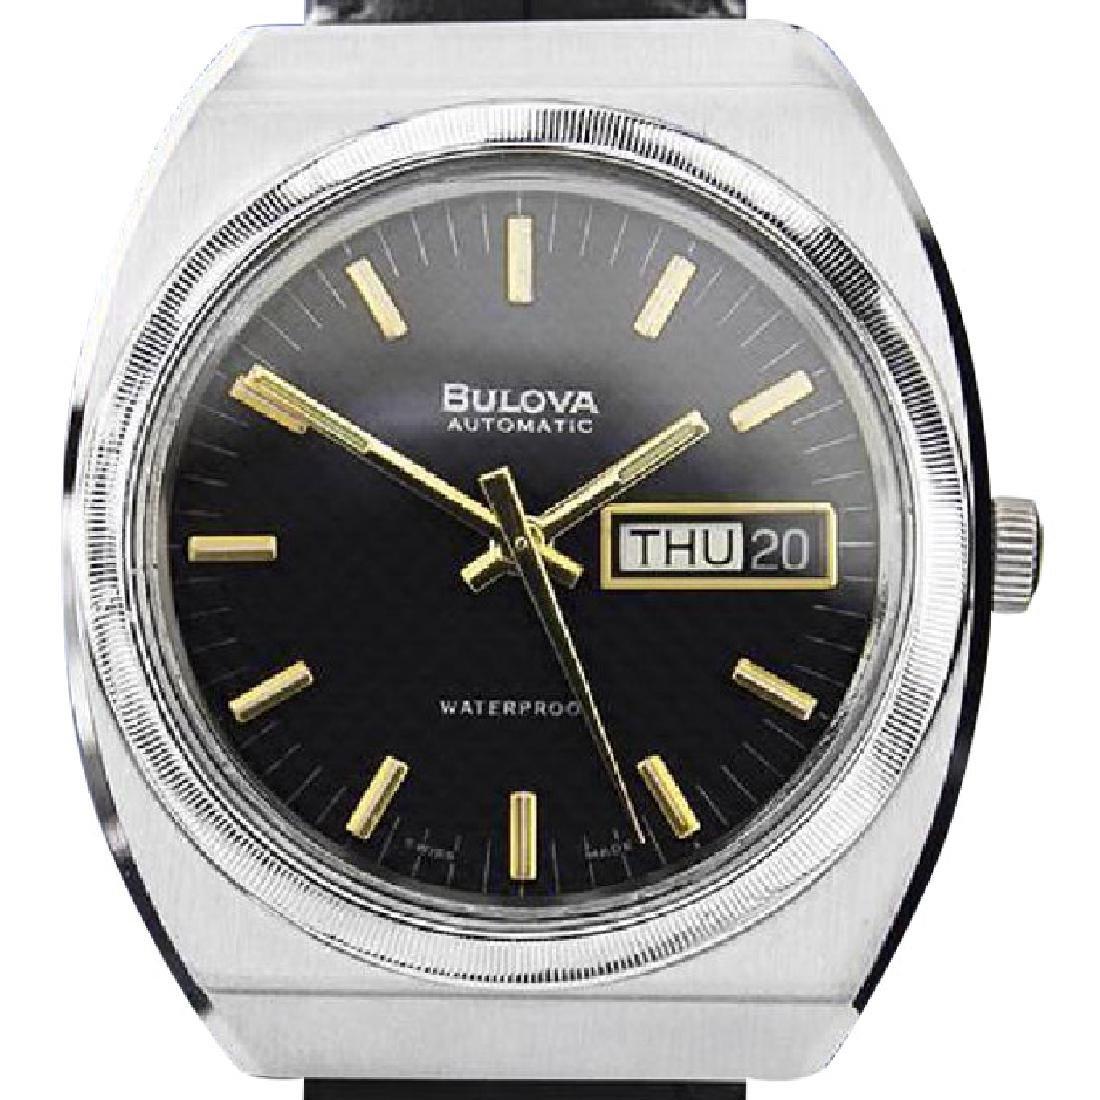 BULOVA | Automatic Black Dial | 1970s